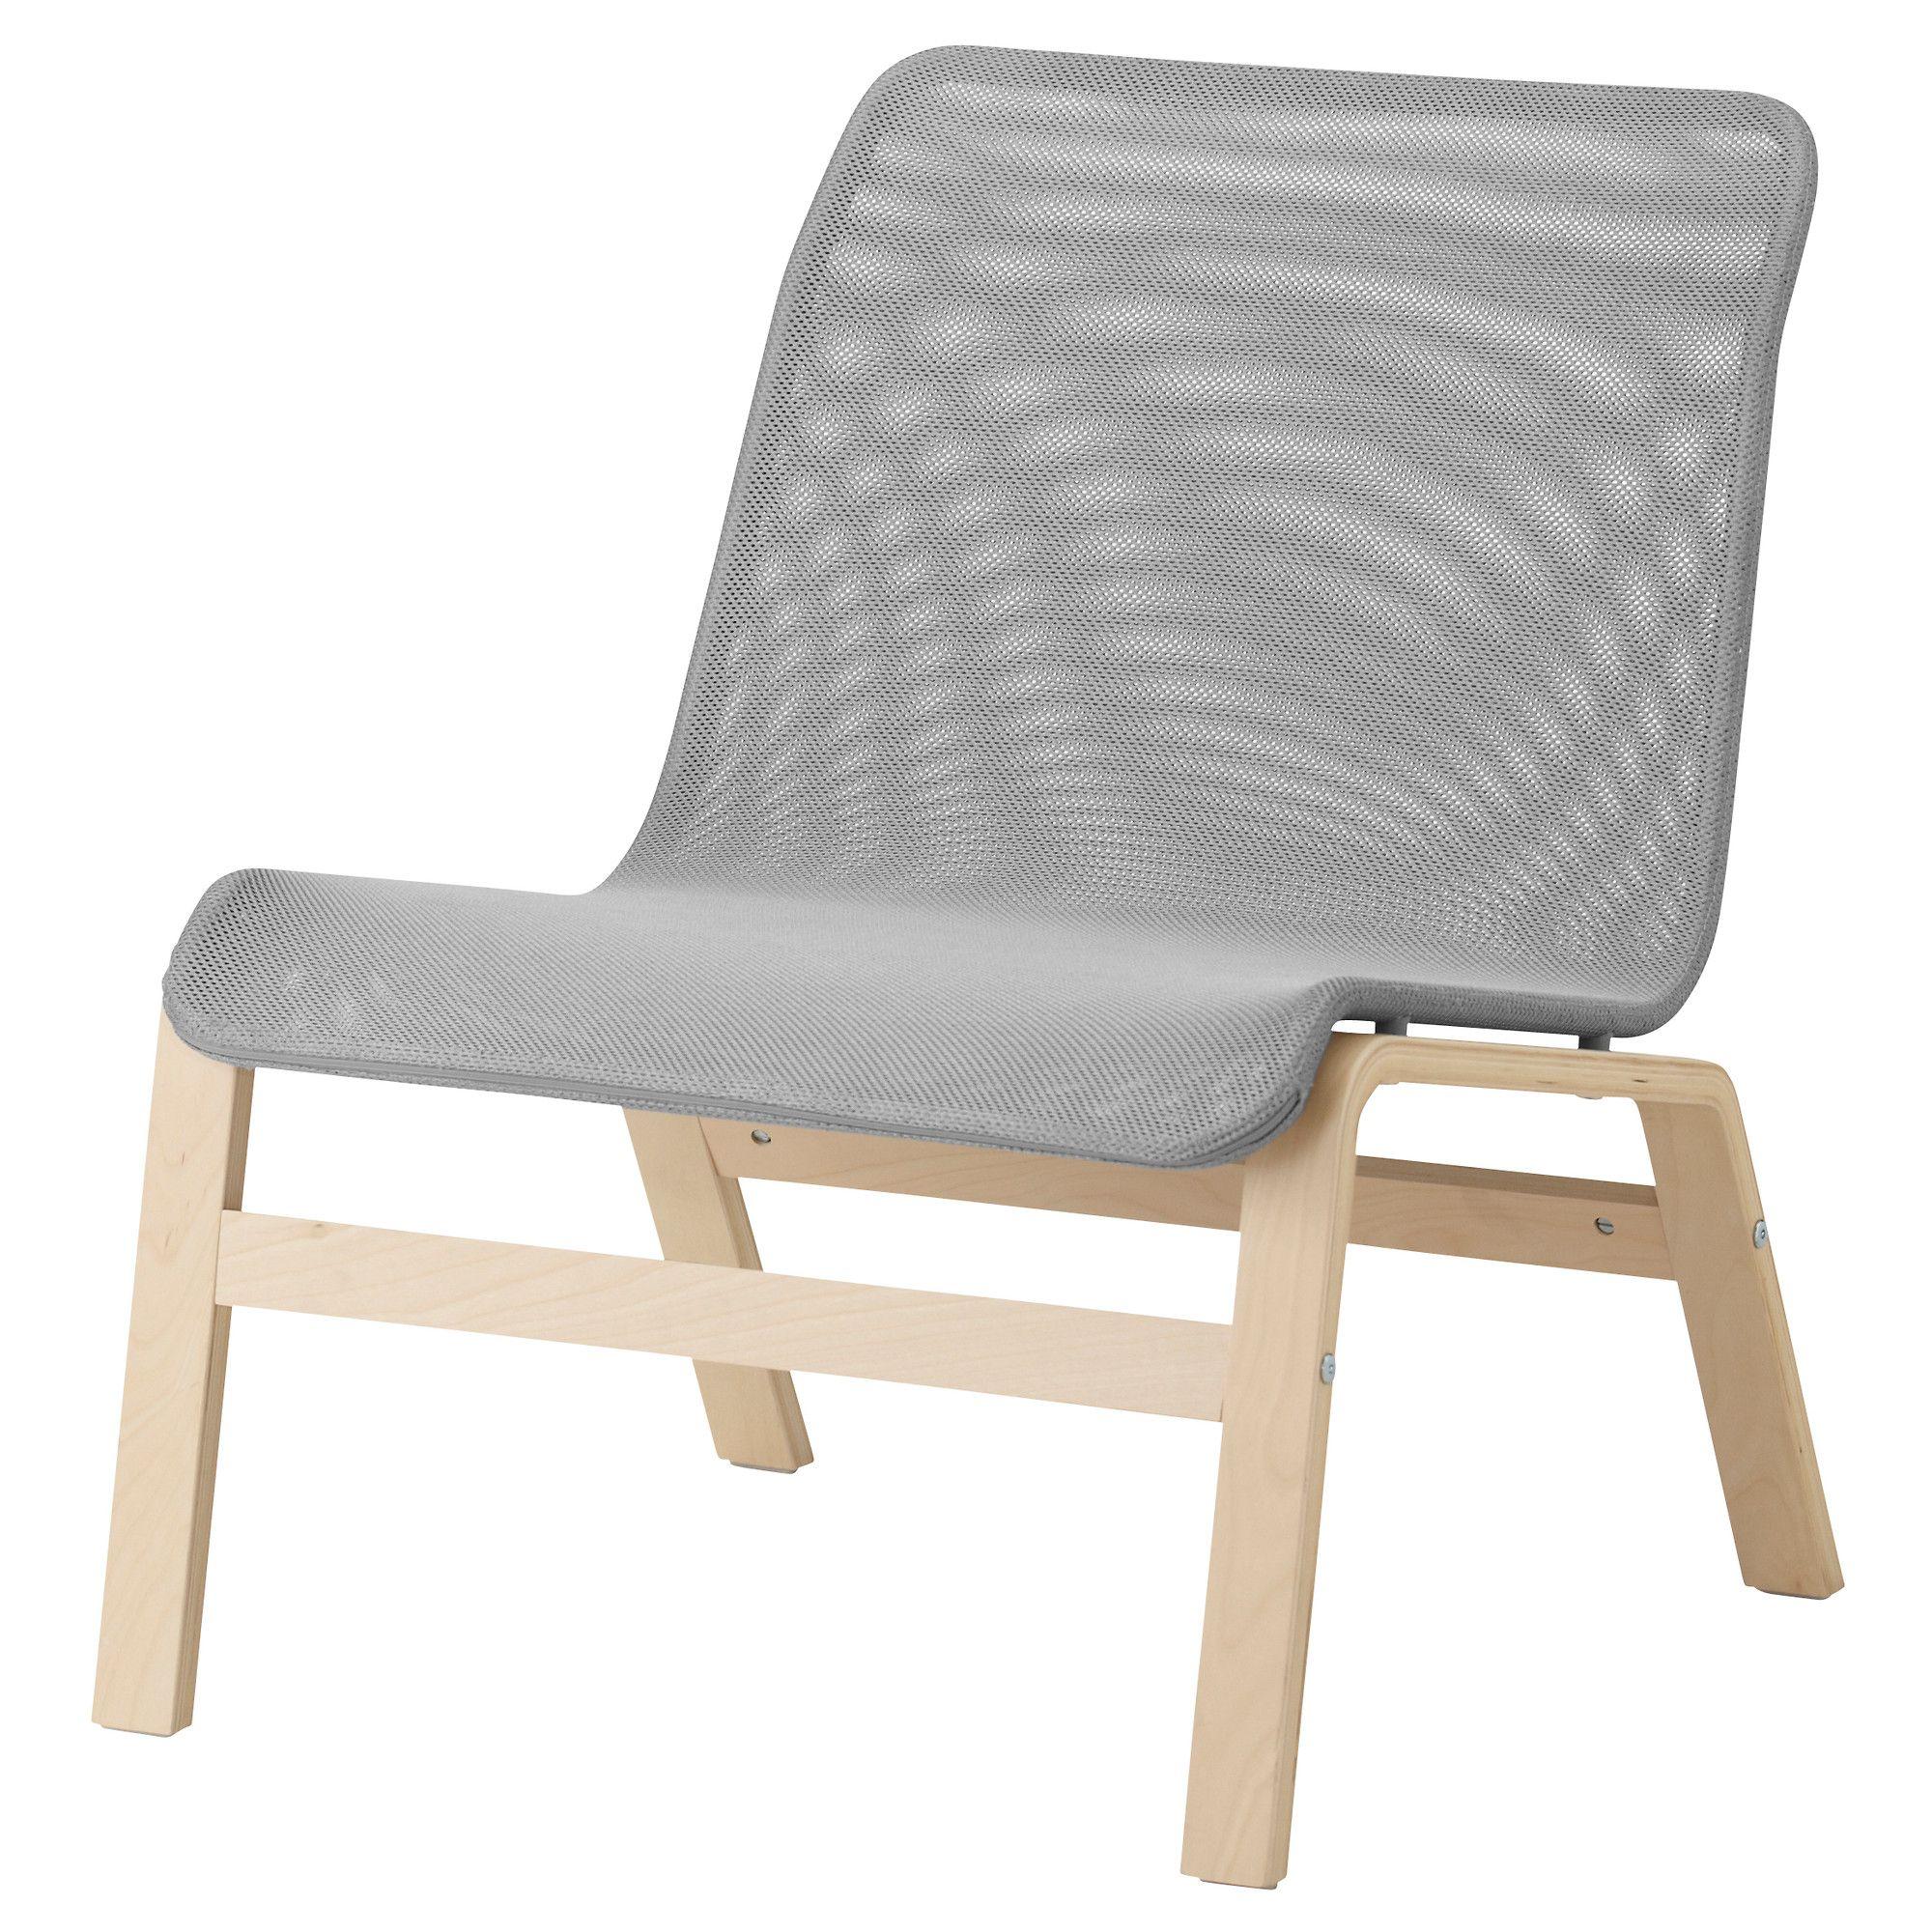 Nolmyra Chair Birch Veneer Gray Ikea Easy Chair Ikea Scandinavian Furniture Design